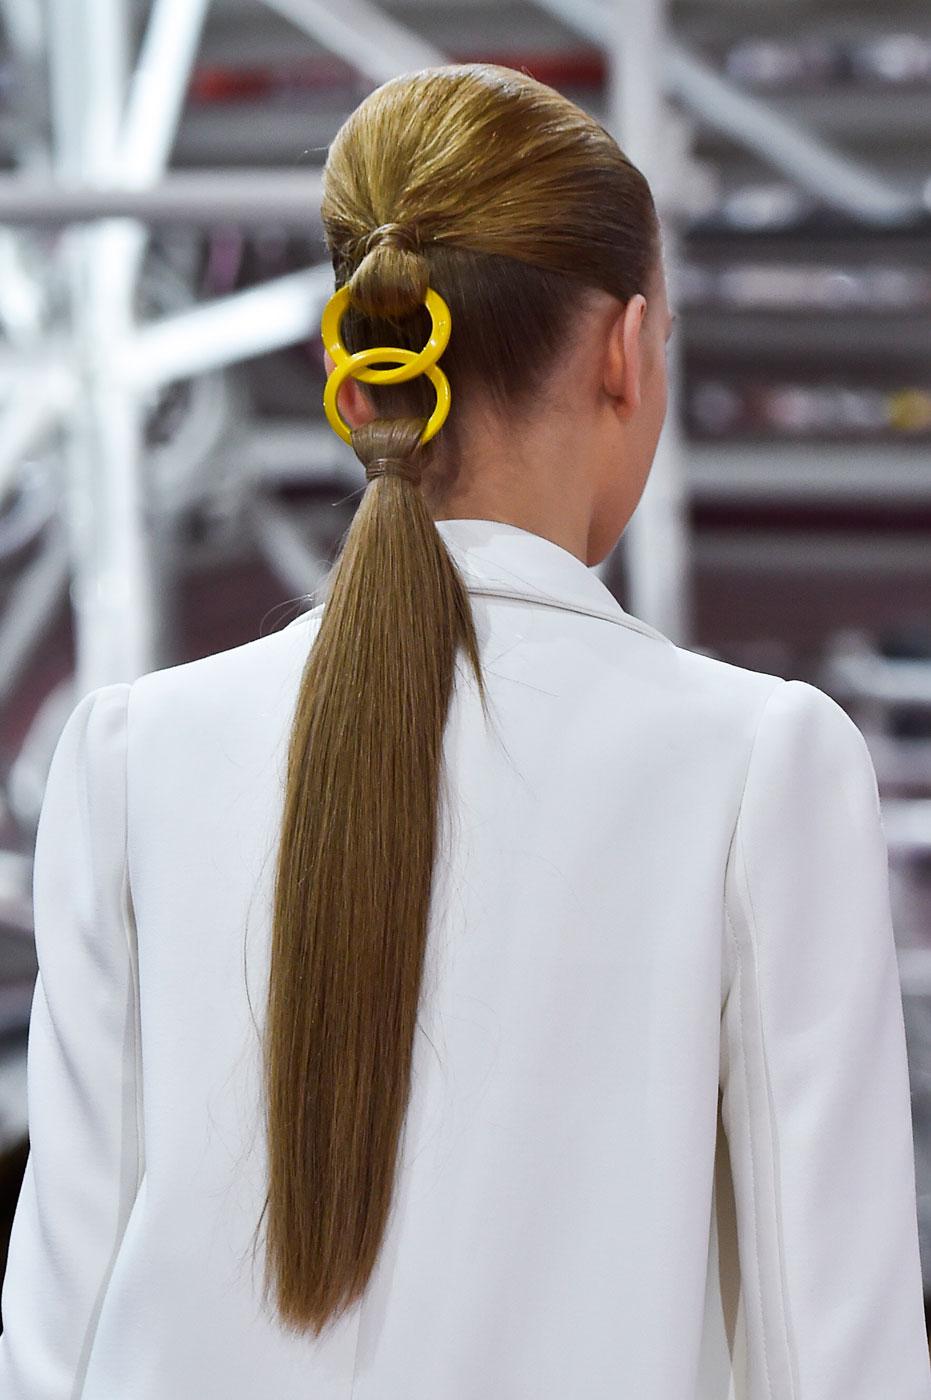 Christian-Dior-fashion-runway-show-close-ups-haute-couture-paris-spring-summer-2015-the-impression-118